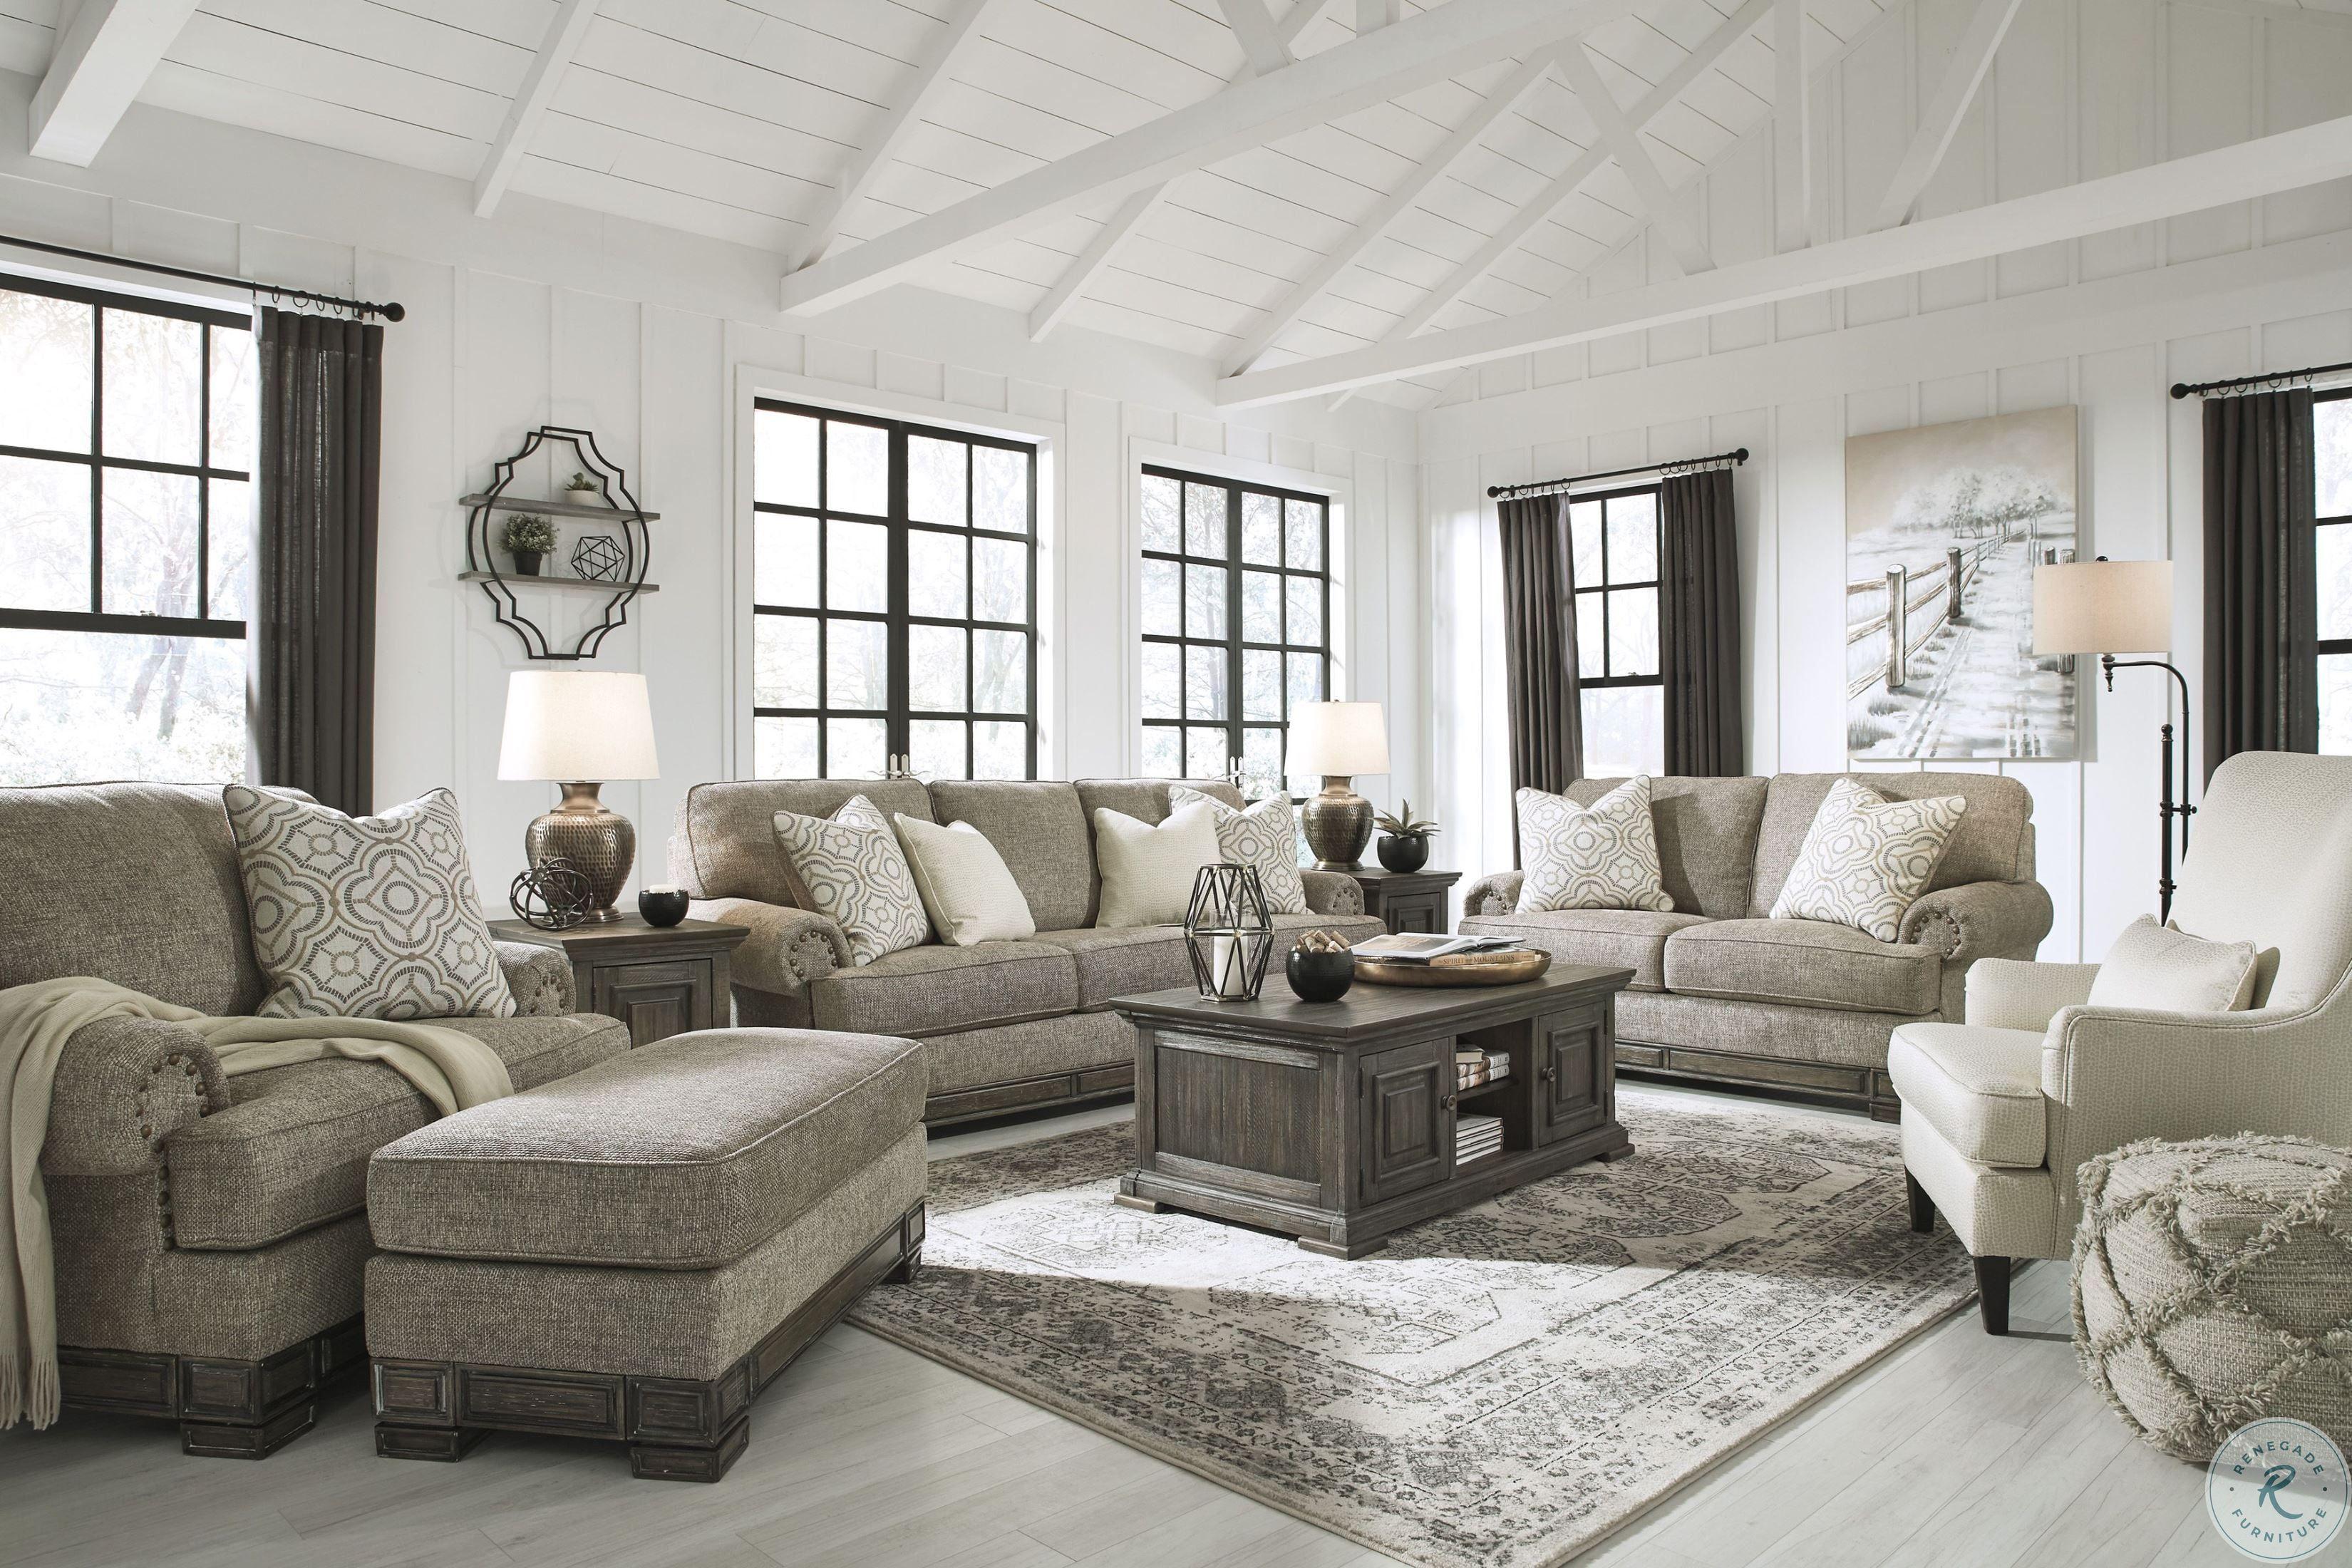 Einsgrove Sandstone Living Room Set Asl 3230238 Room In 2020 Living Room Sets Furniture Furniture Design Living Room Farm House Living Room